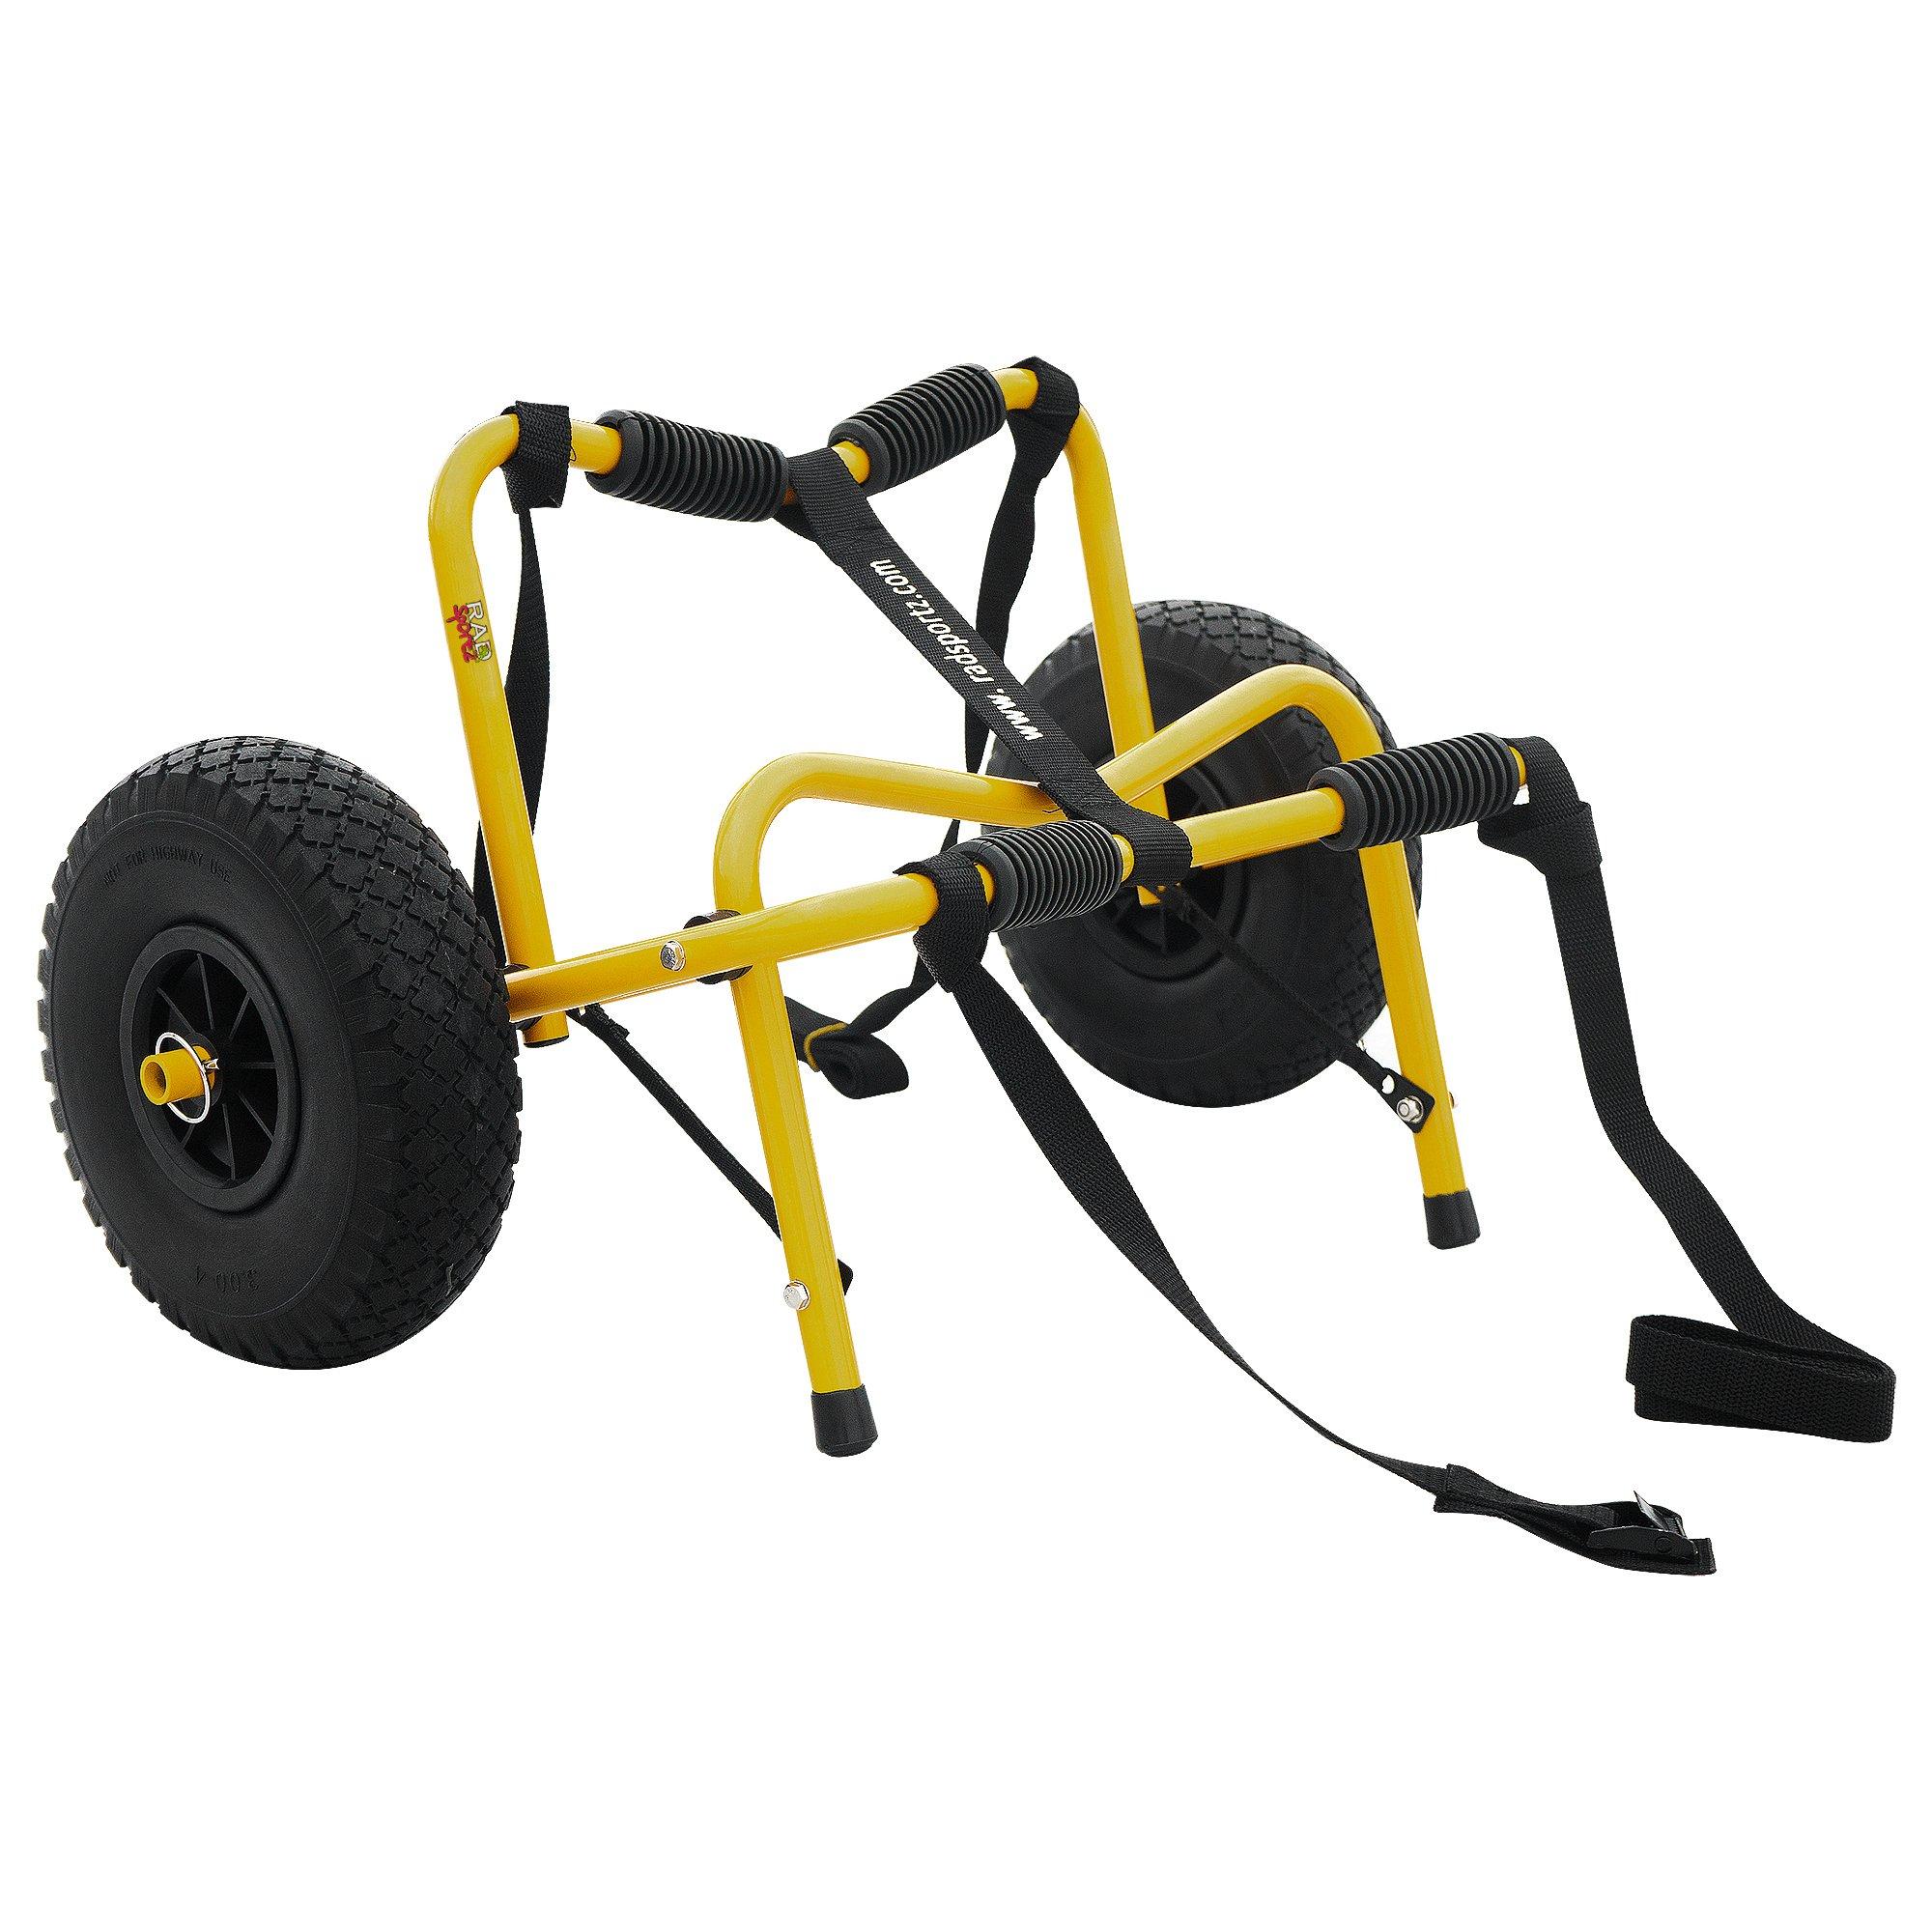 1235 RAD Sportz Kayak Trolley Pro Premium Kayak Cart Airless Tires 150 LB Cap Yellow by RAD Sportz